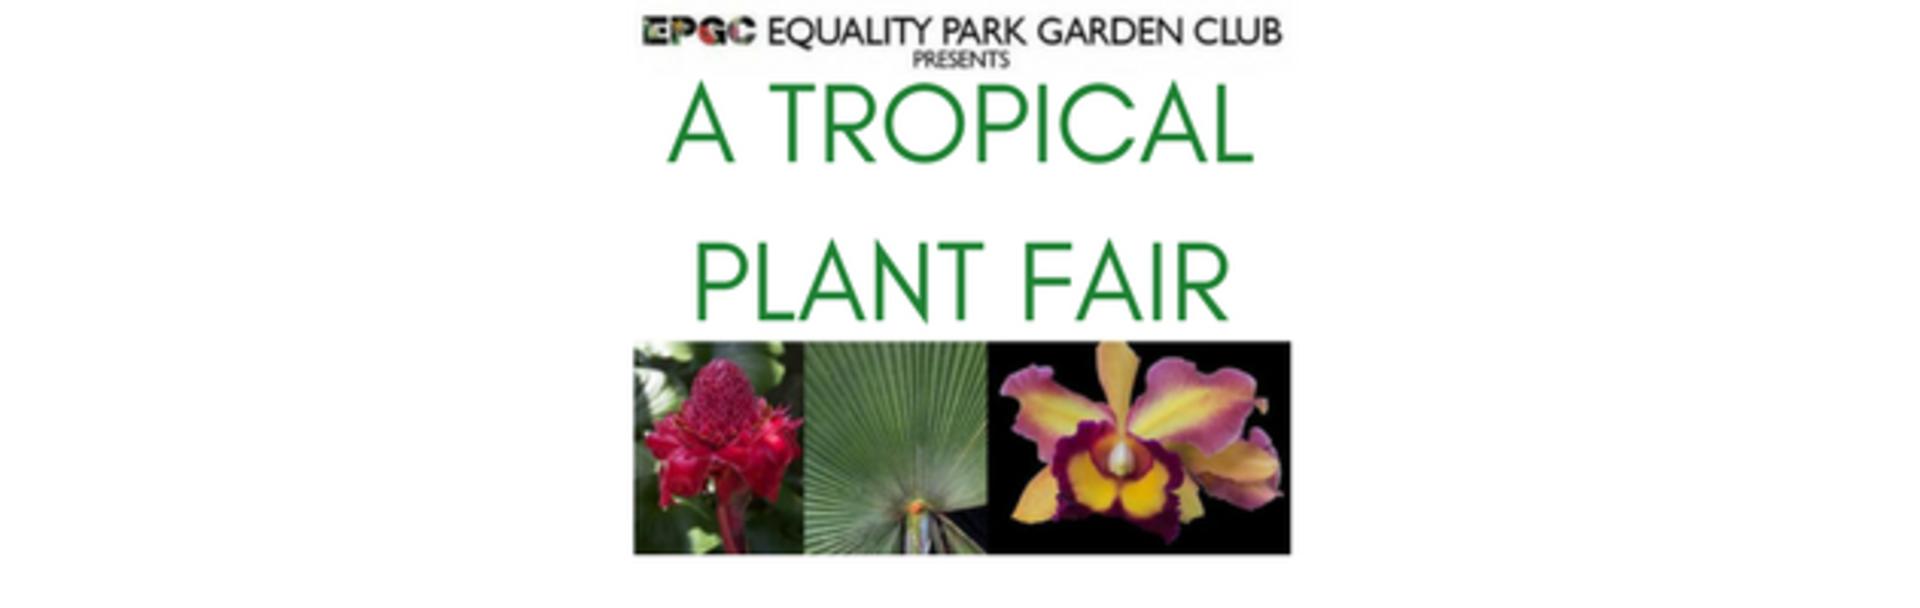 Equality Park Garden Cub's Tropical Plant Fair